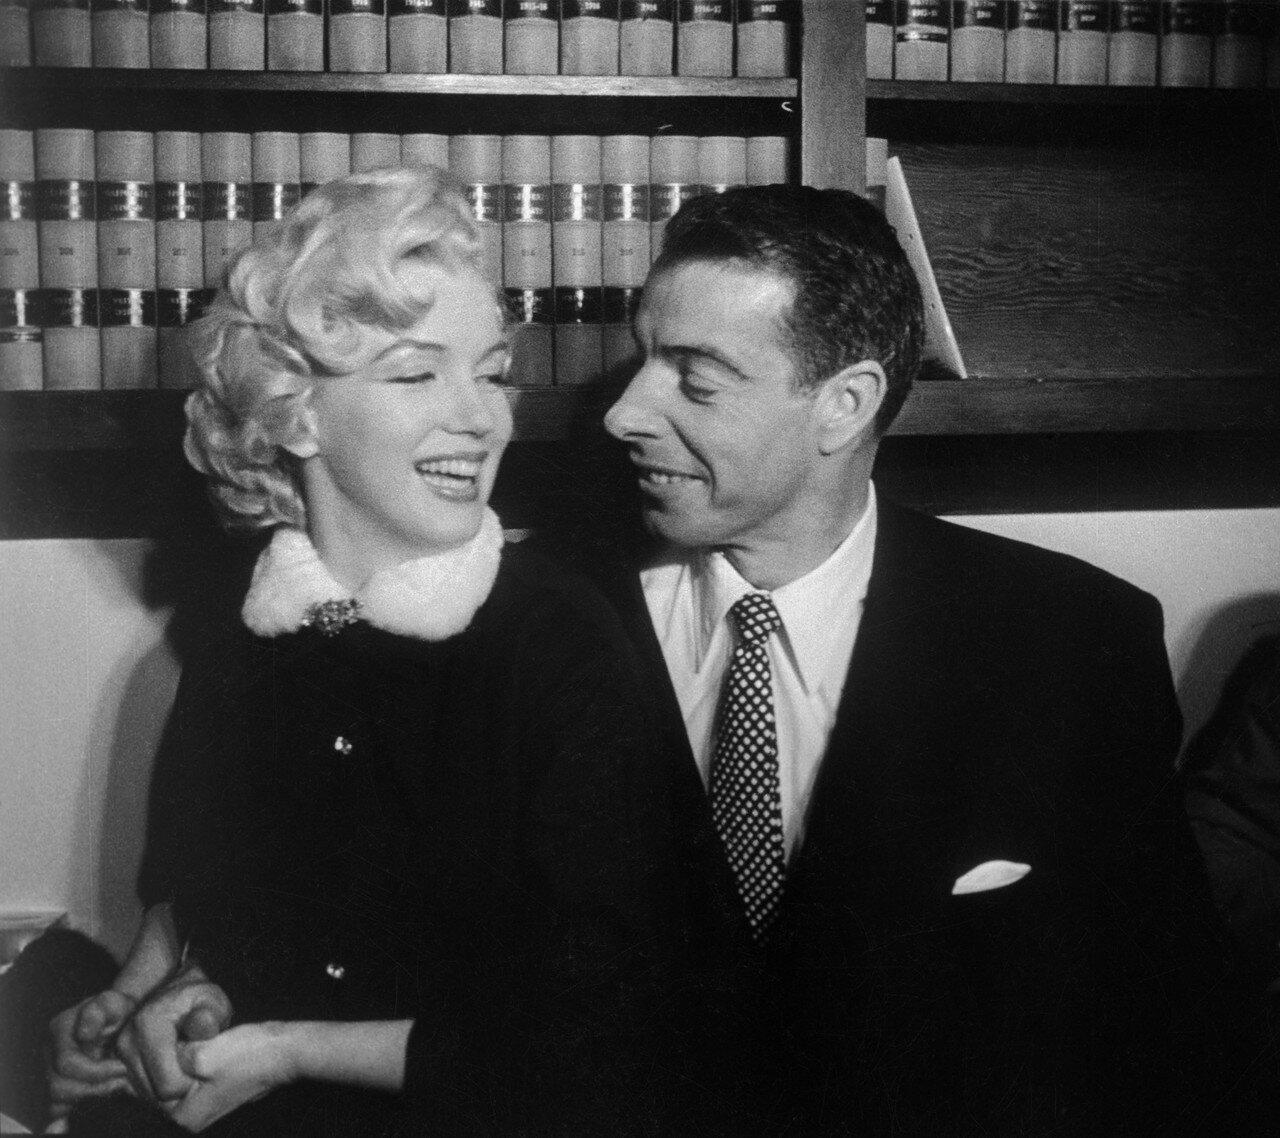 Marilyn Monroe and Joe DiMaggio Smiling